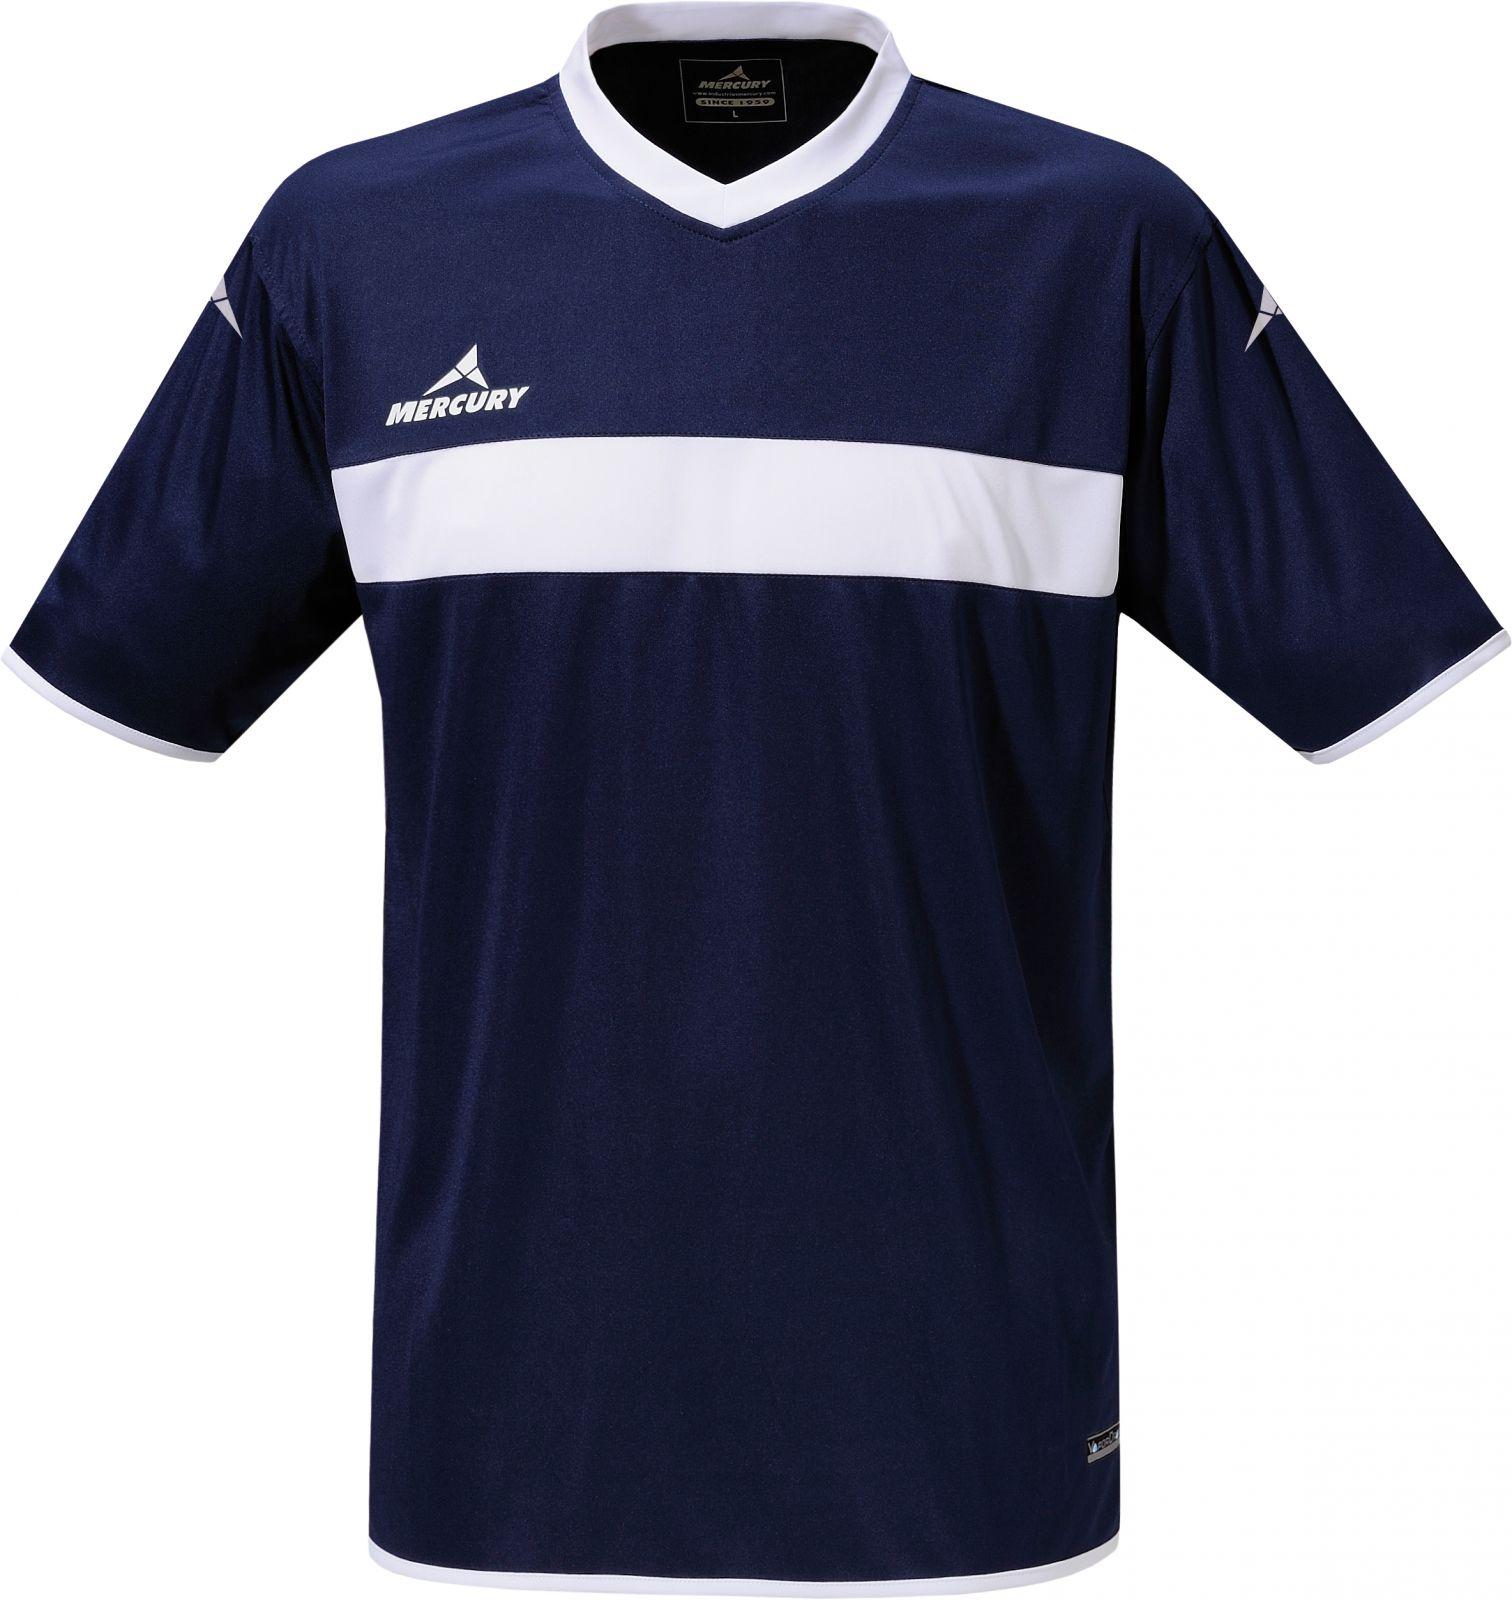 Camiseta Mercury Pro MECCBA 0502